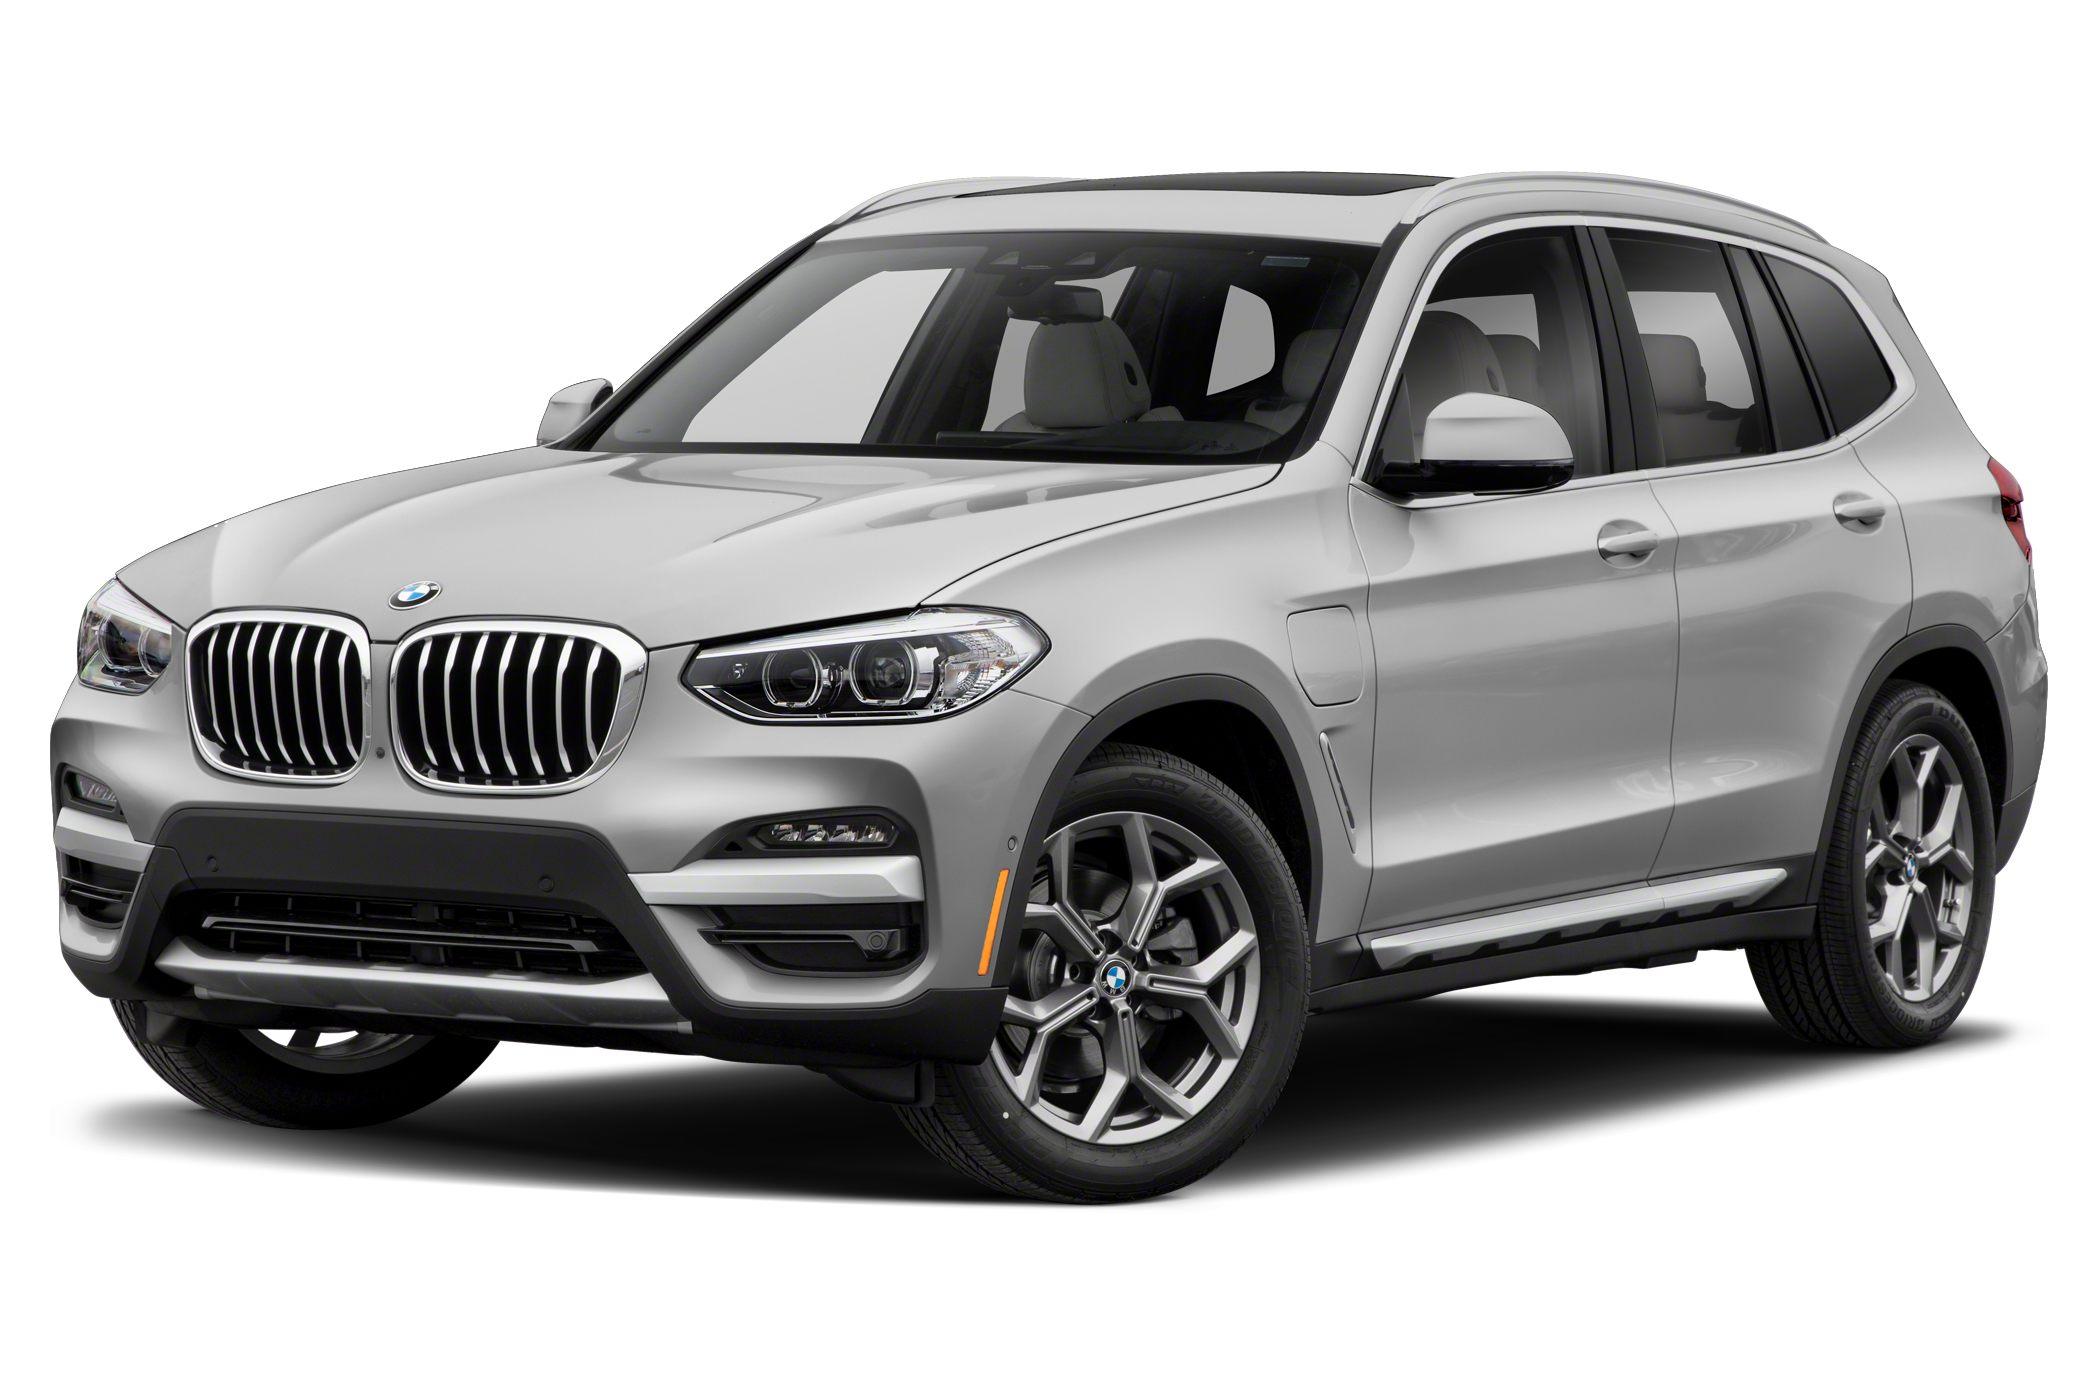 2021 BMW X3 Hybrid Release Date